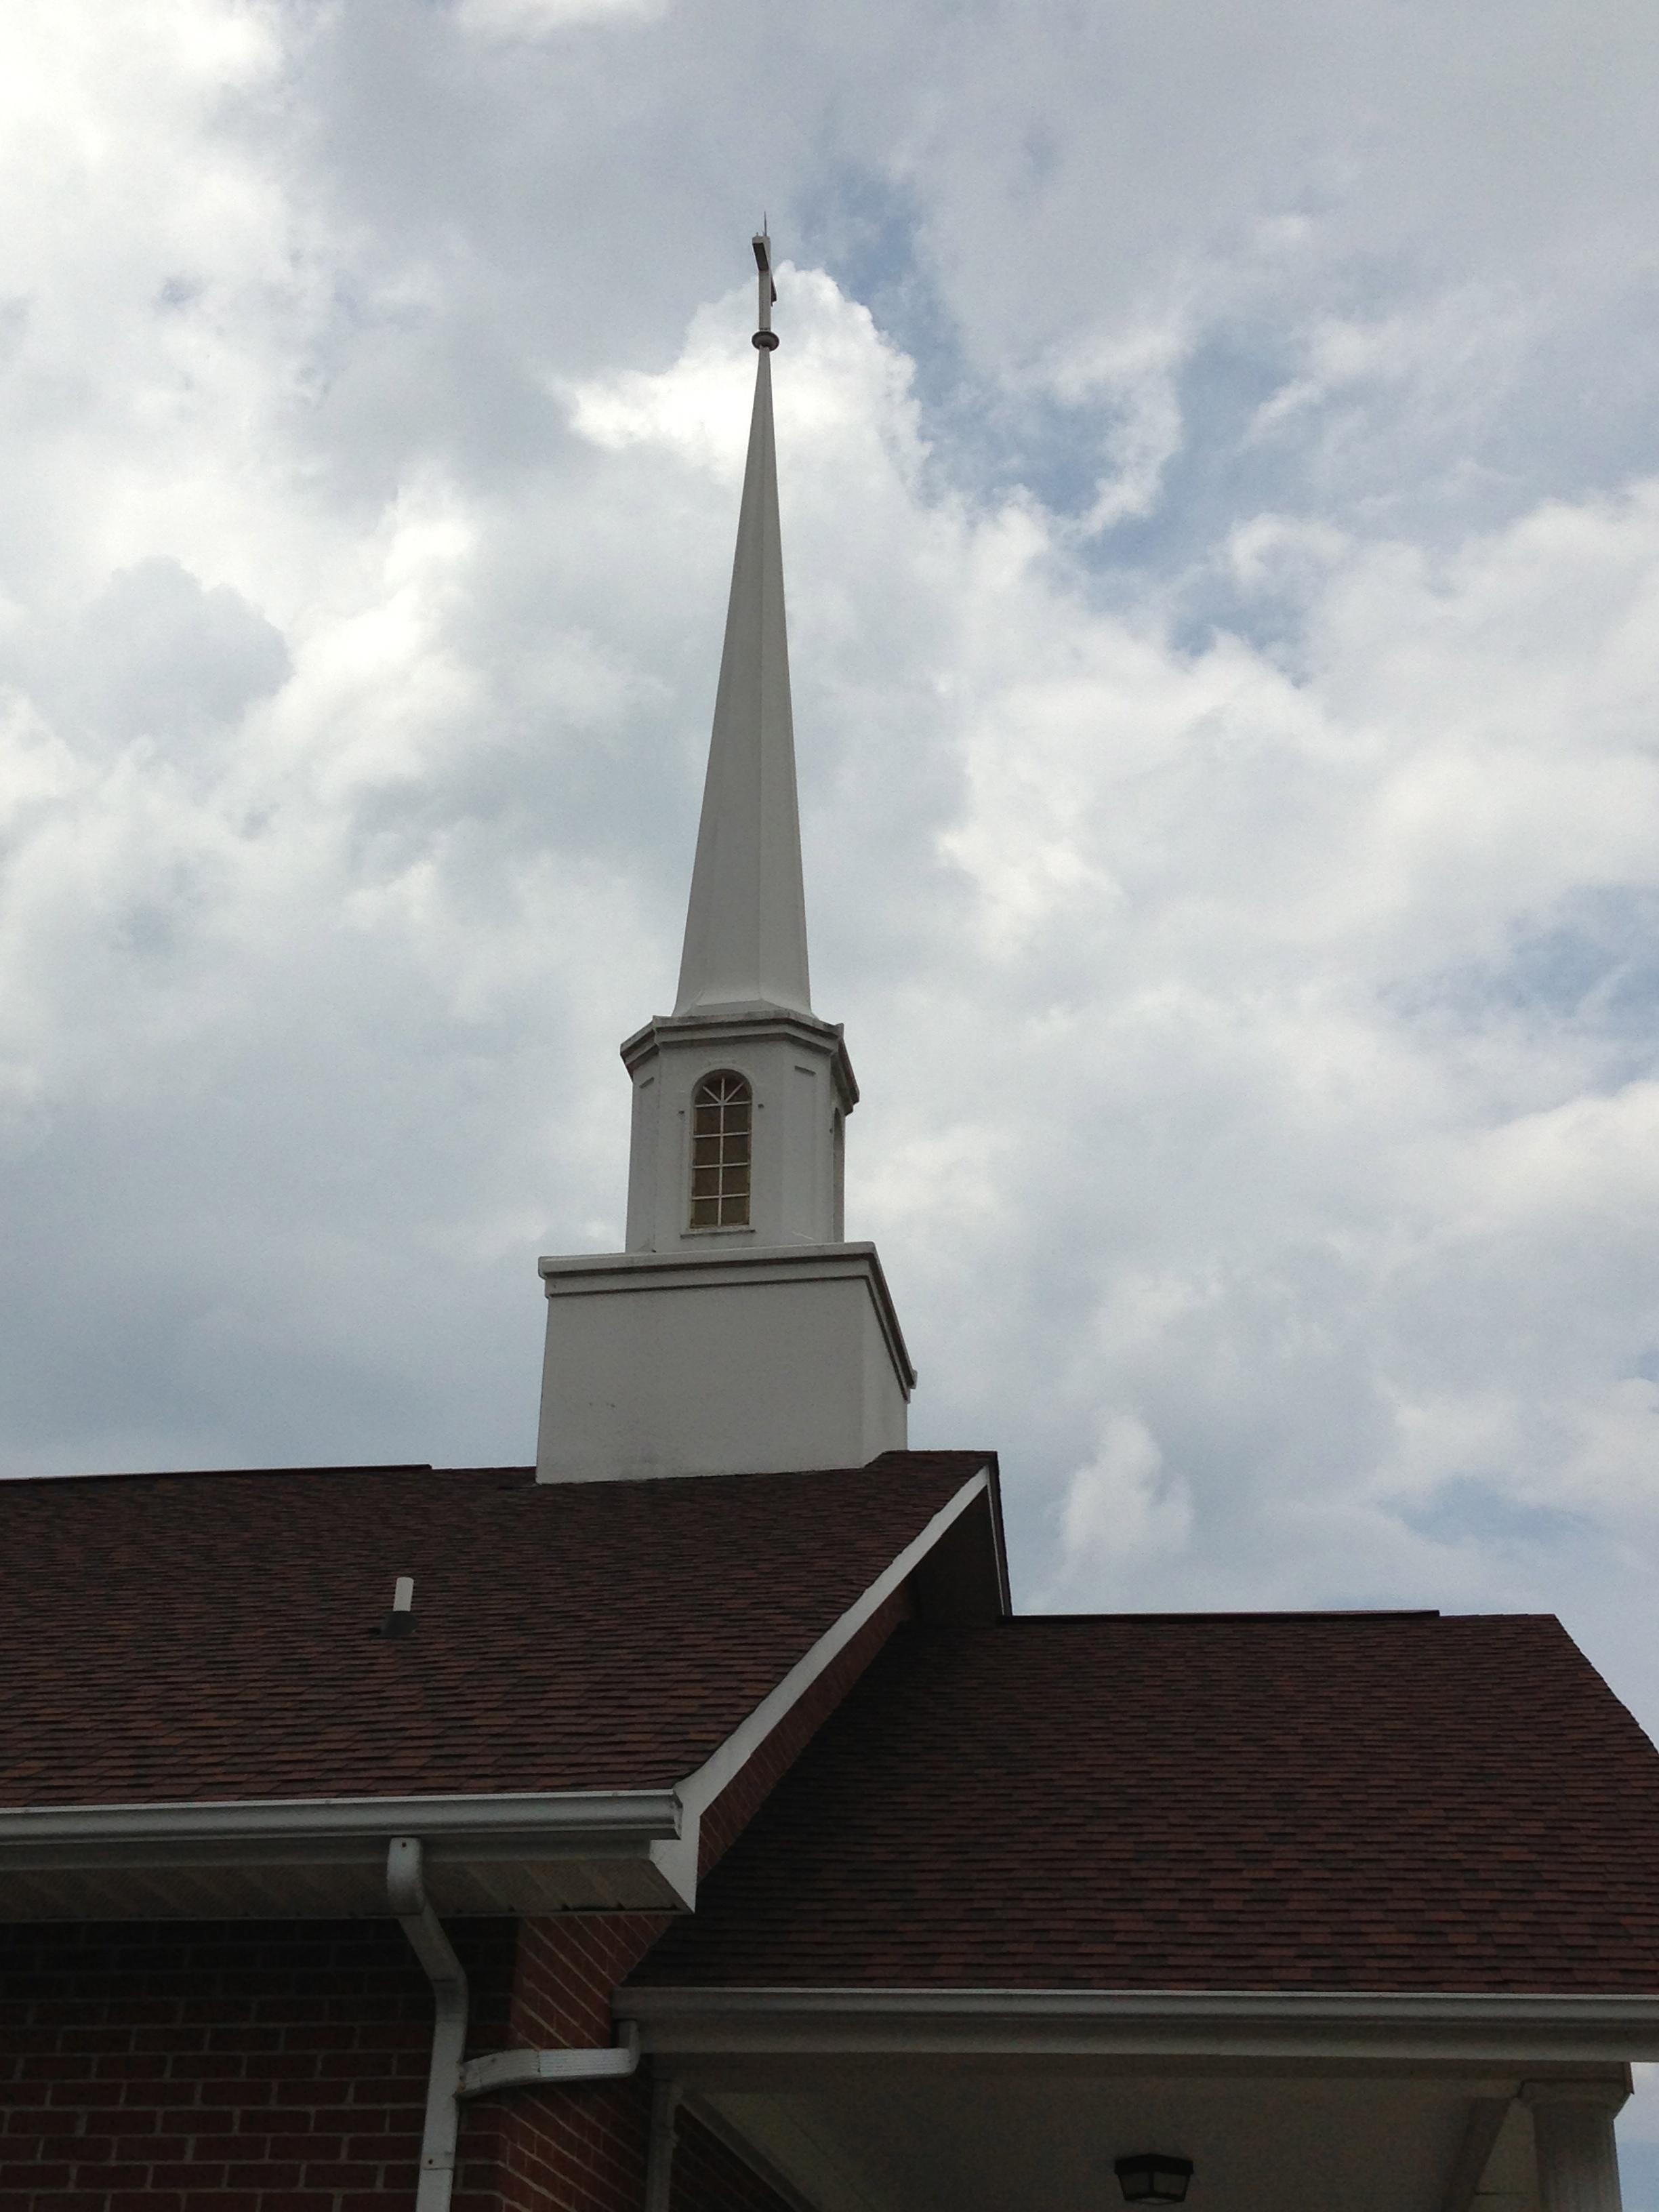 Church steeples church depot llc 1 855 739 7372 altavistaventures Image collections